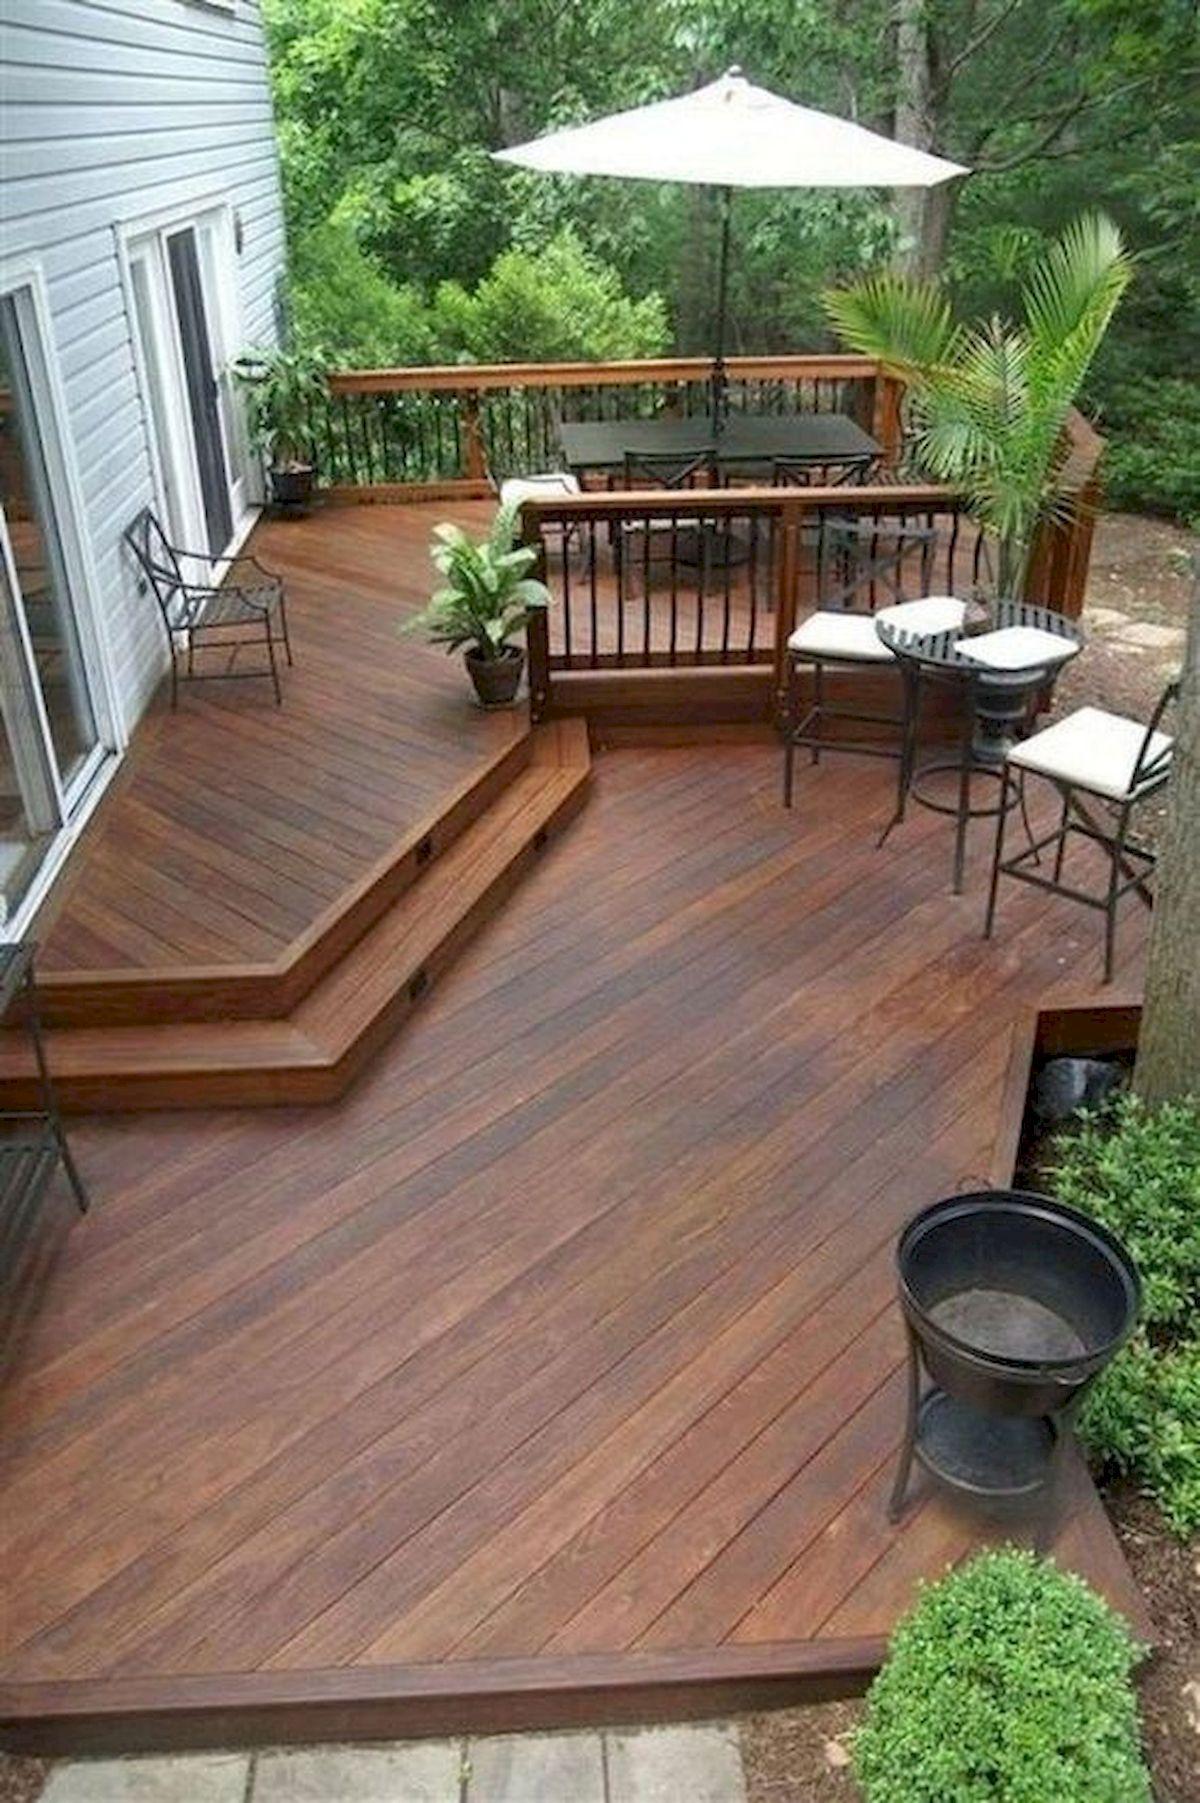 50 Fantastic Backyard Patio and Decking Design Ideas (5)